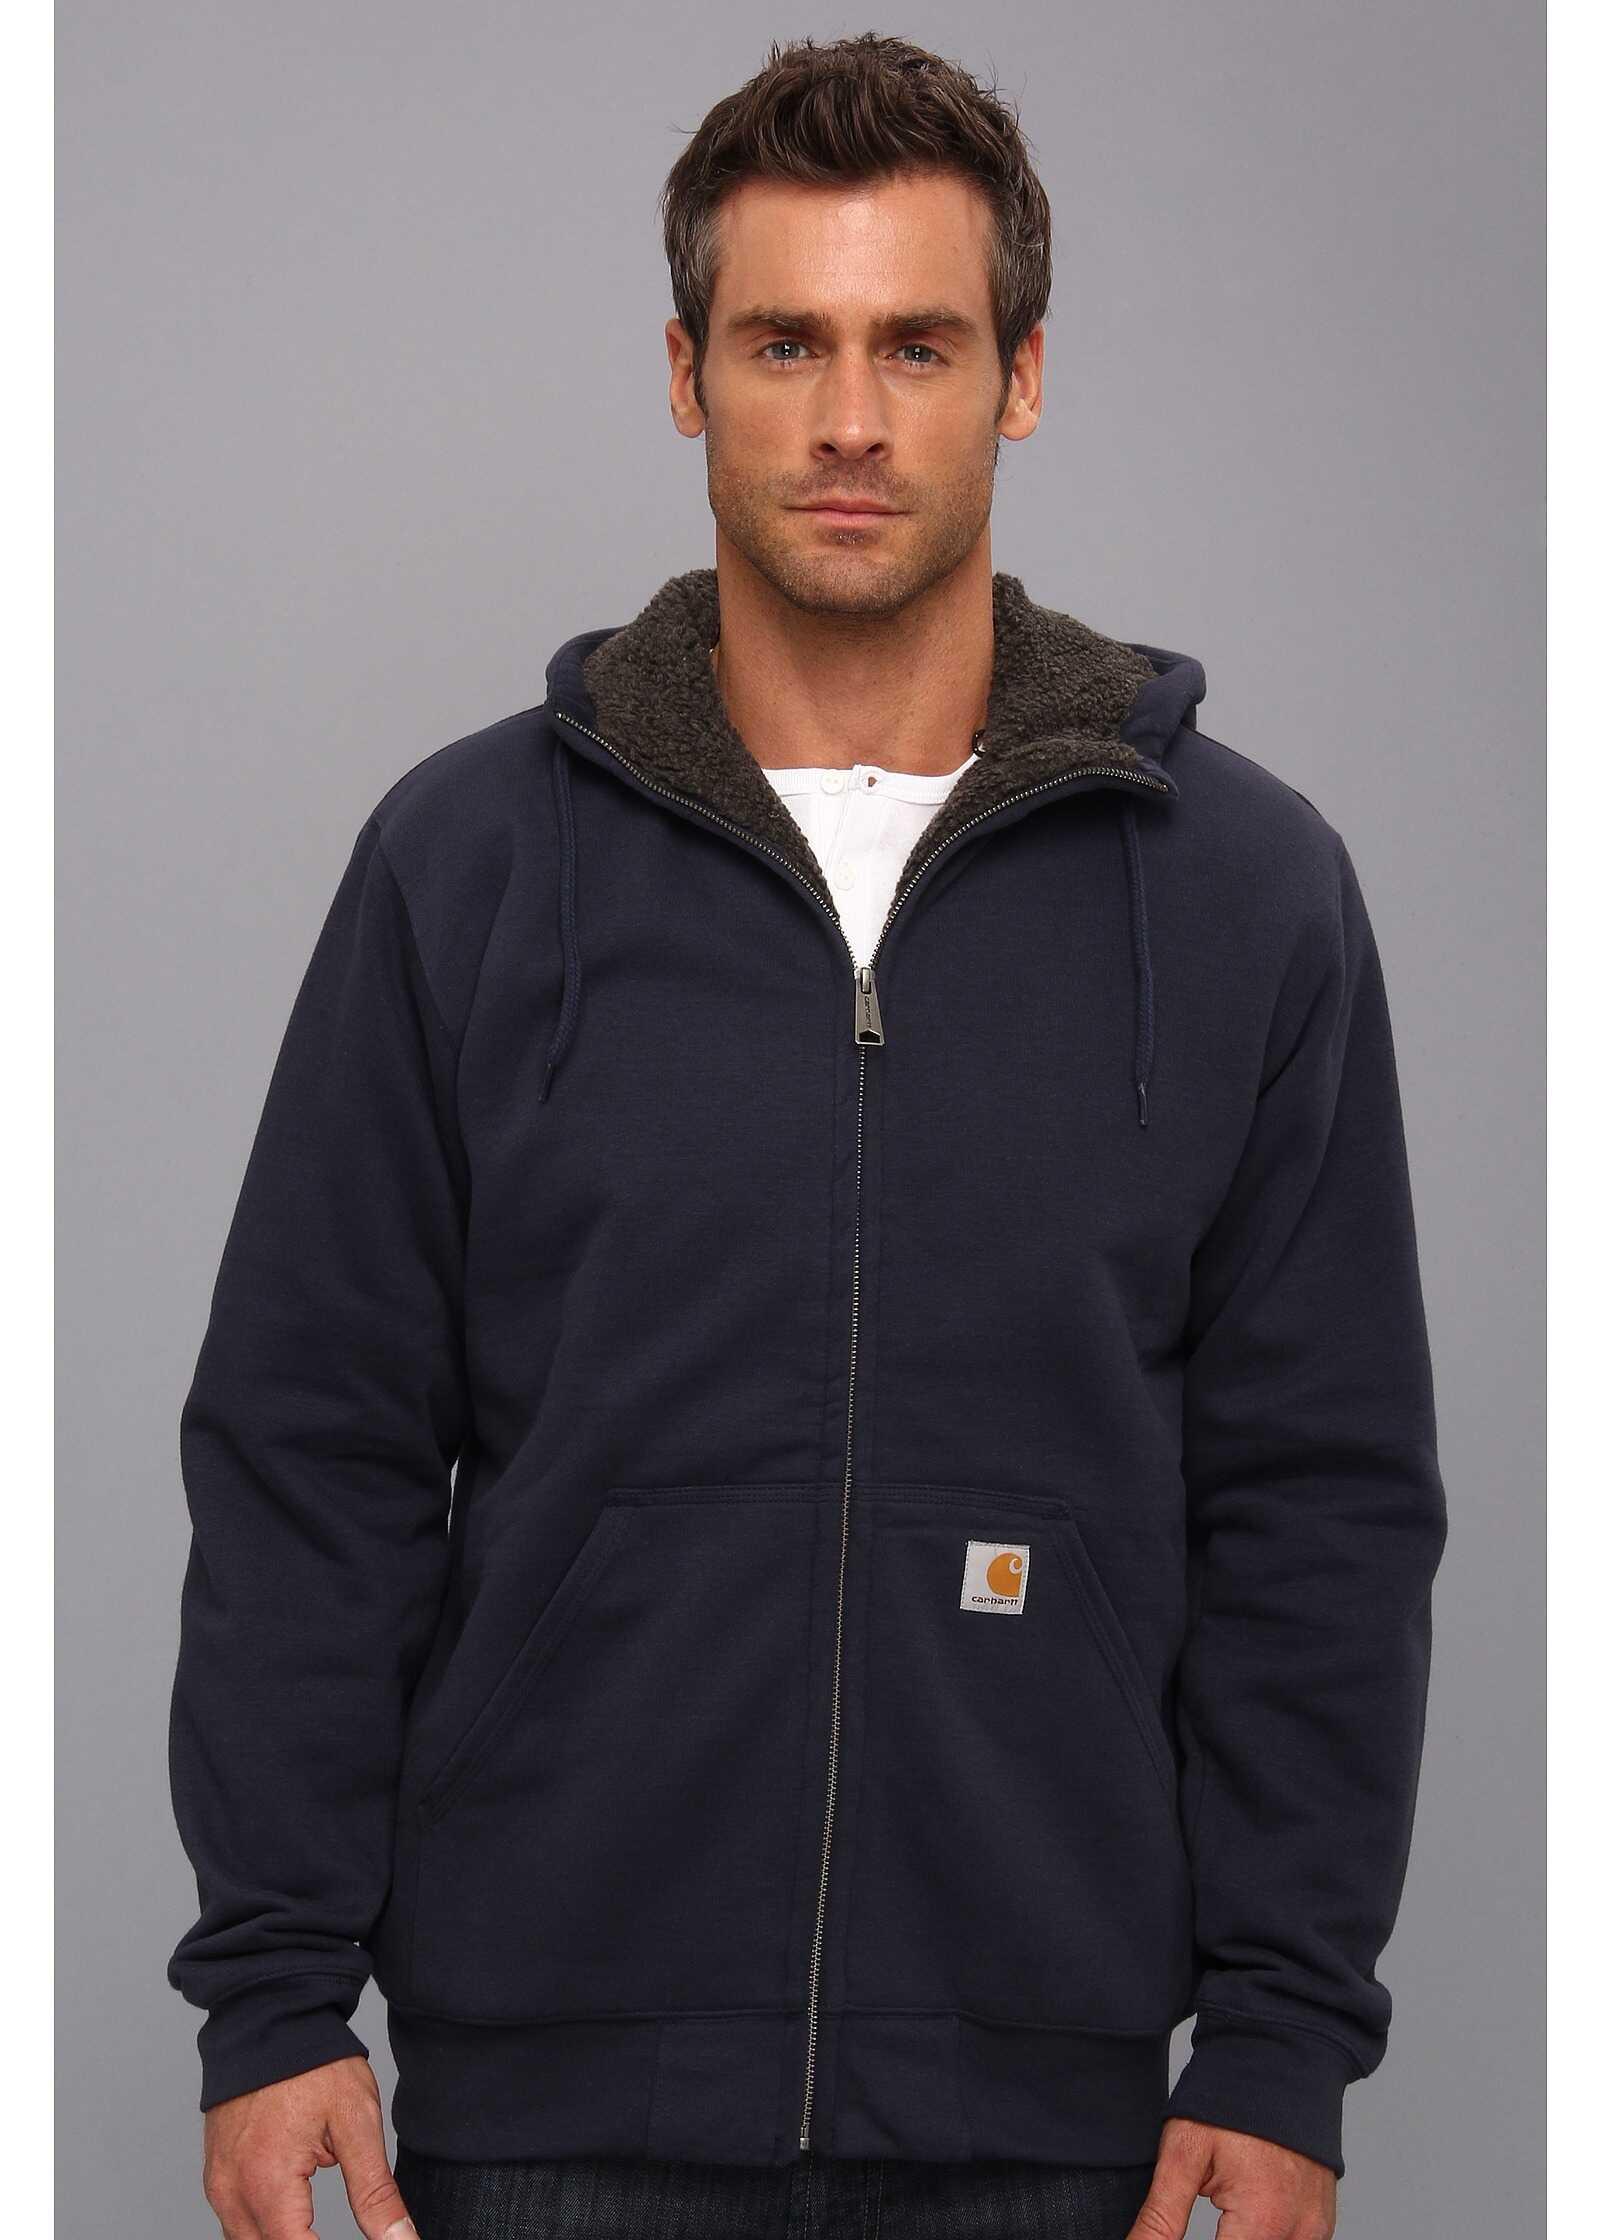 Carhartt Brushed Fleece Sweatshirt Sherpa Lined New Navy